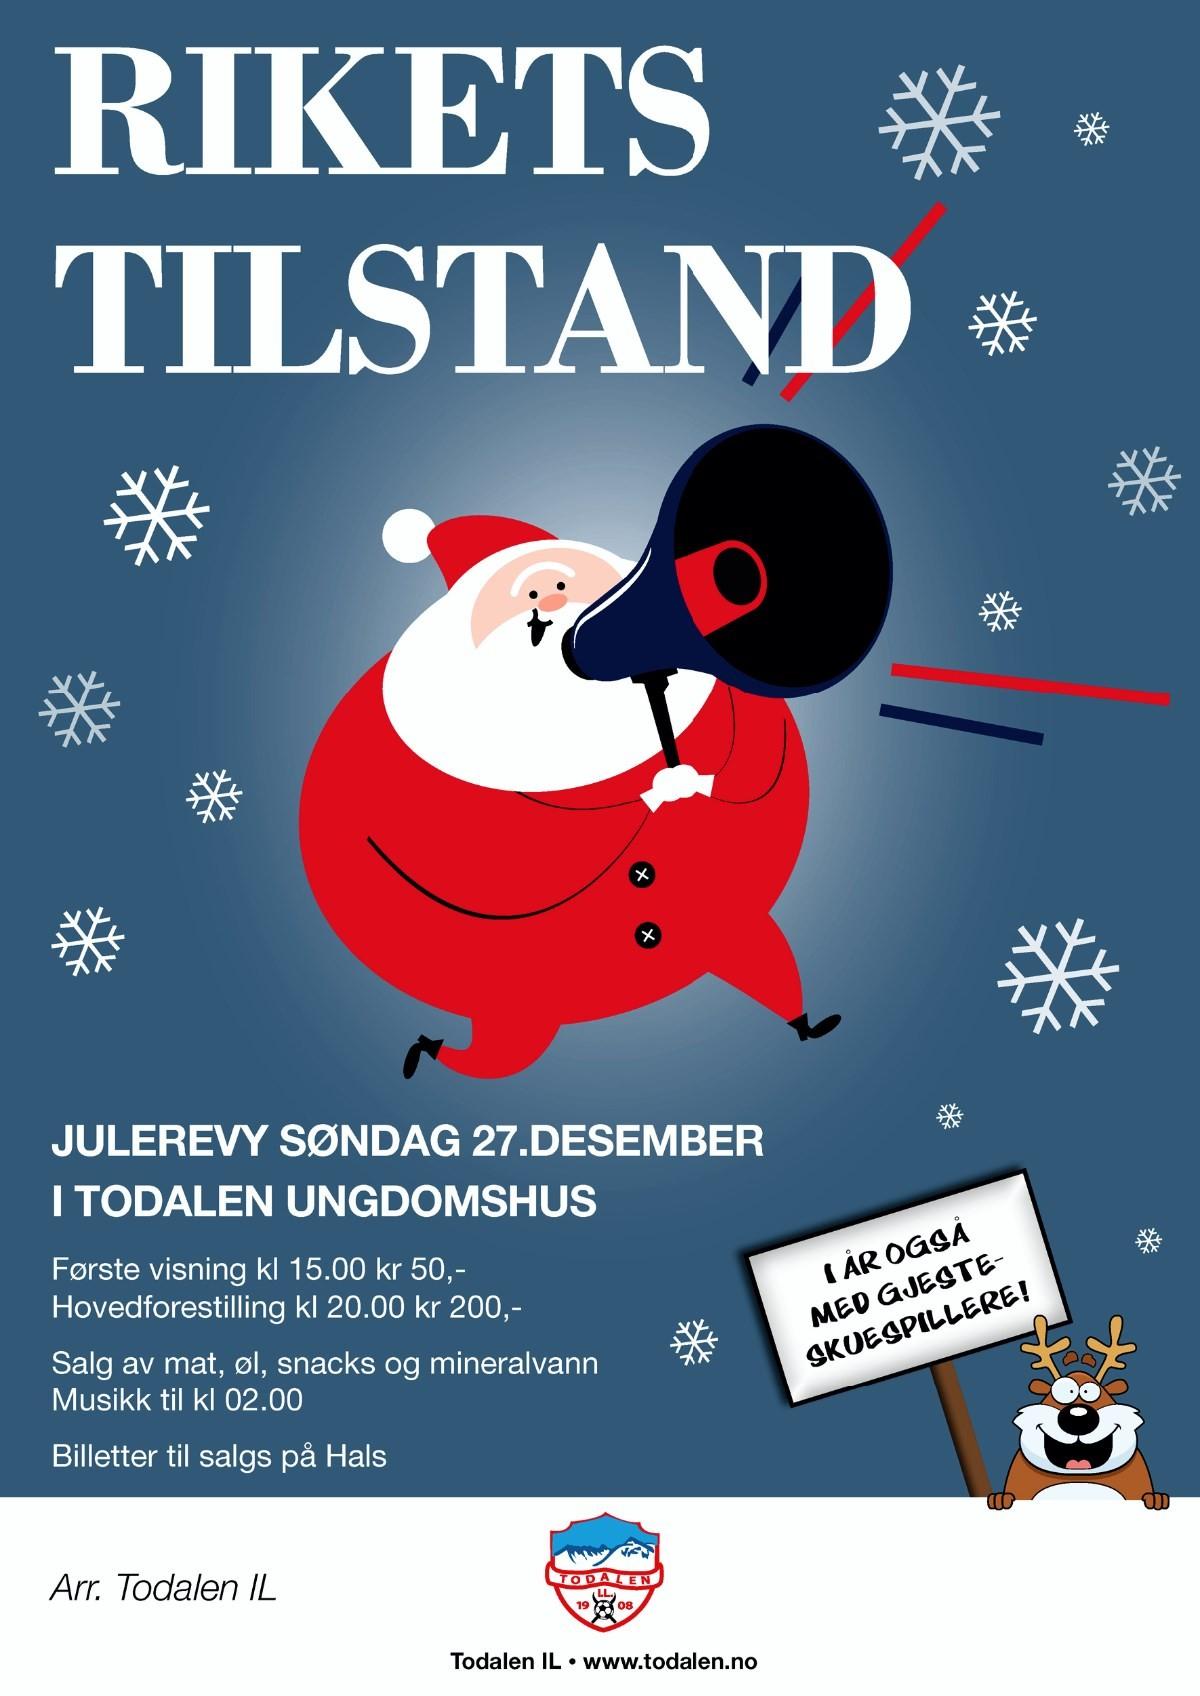 """Rikets tilstand"" heiter årets julerevy.  Plakatdesign: Lillian Halle"